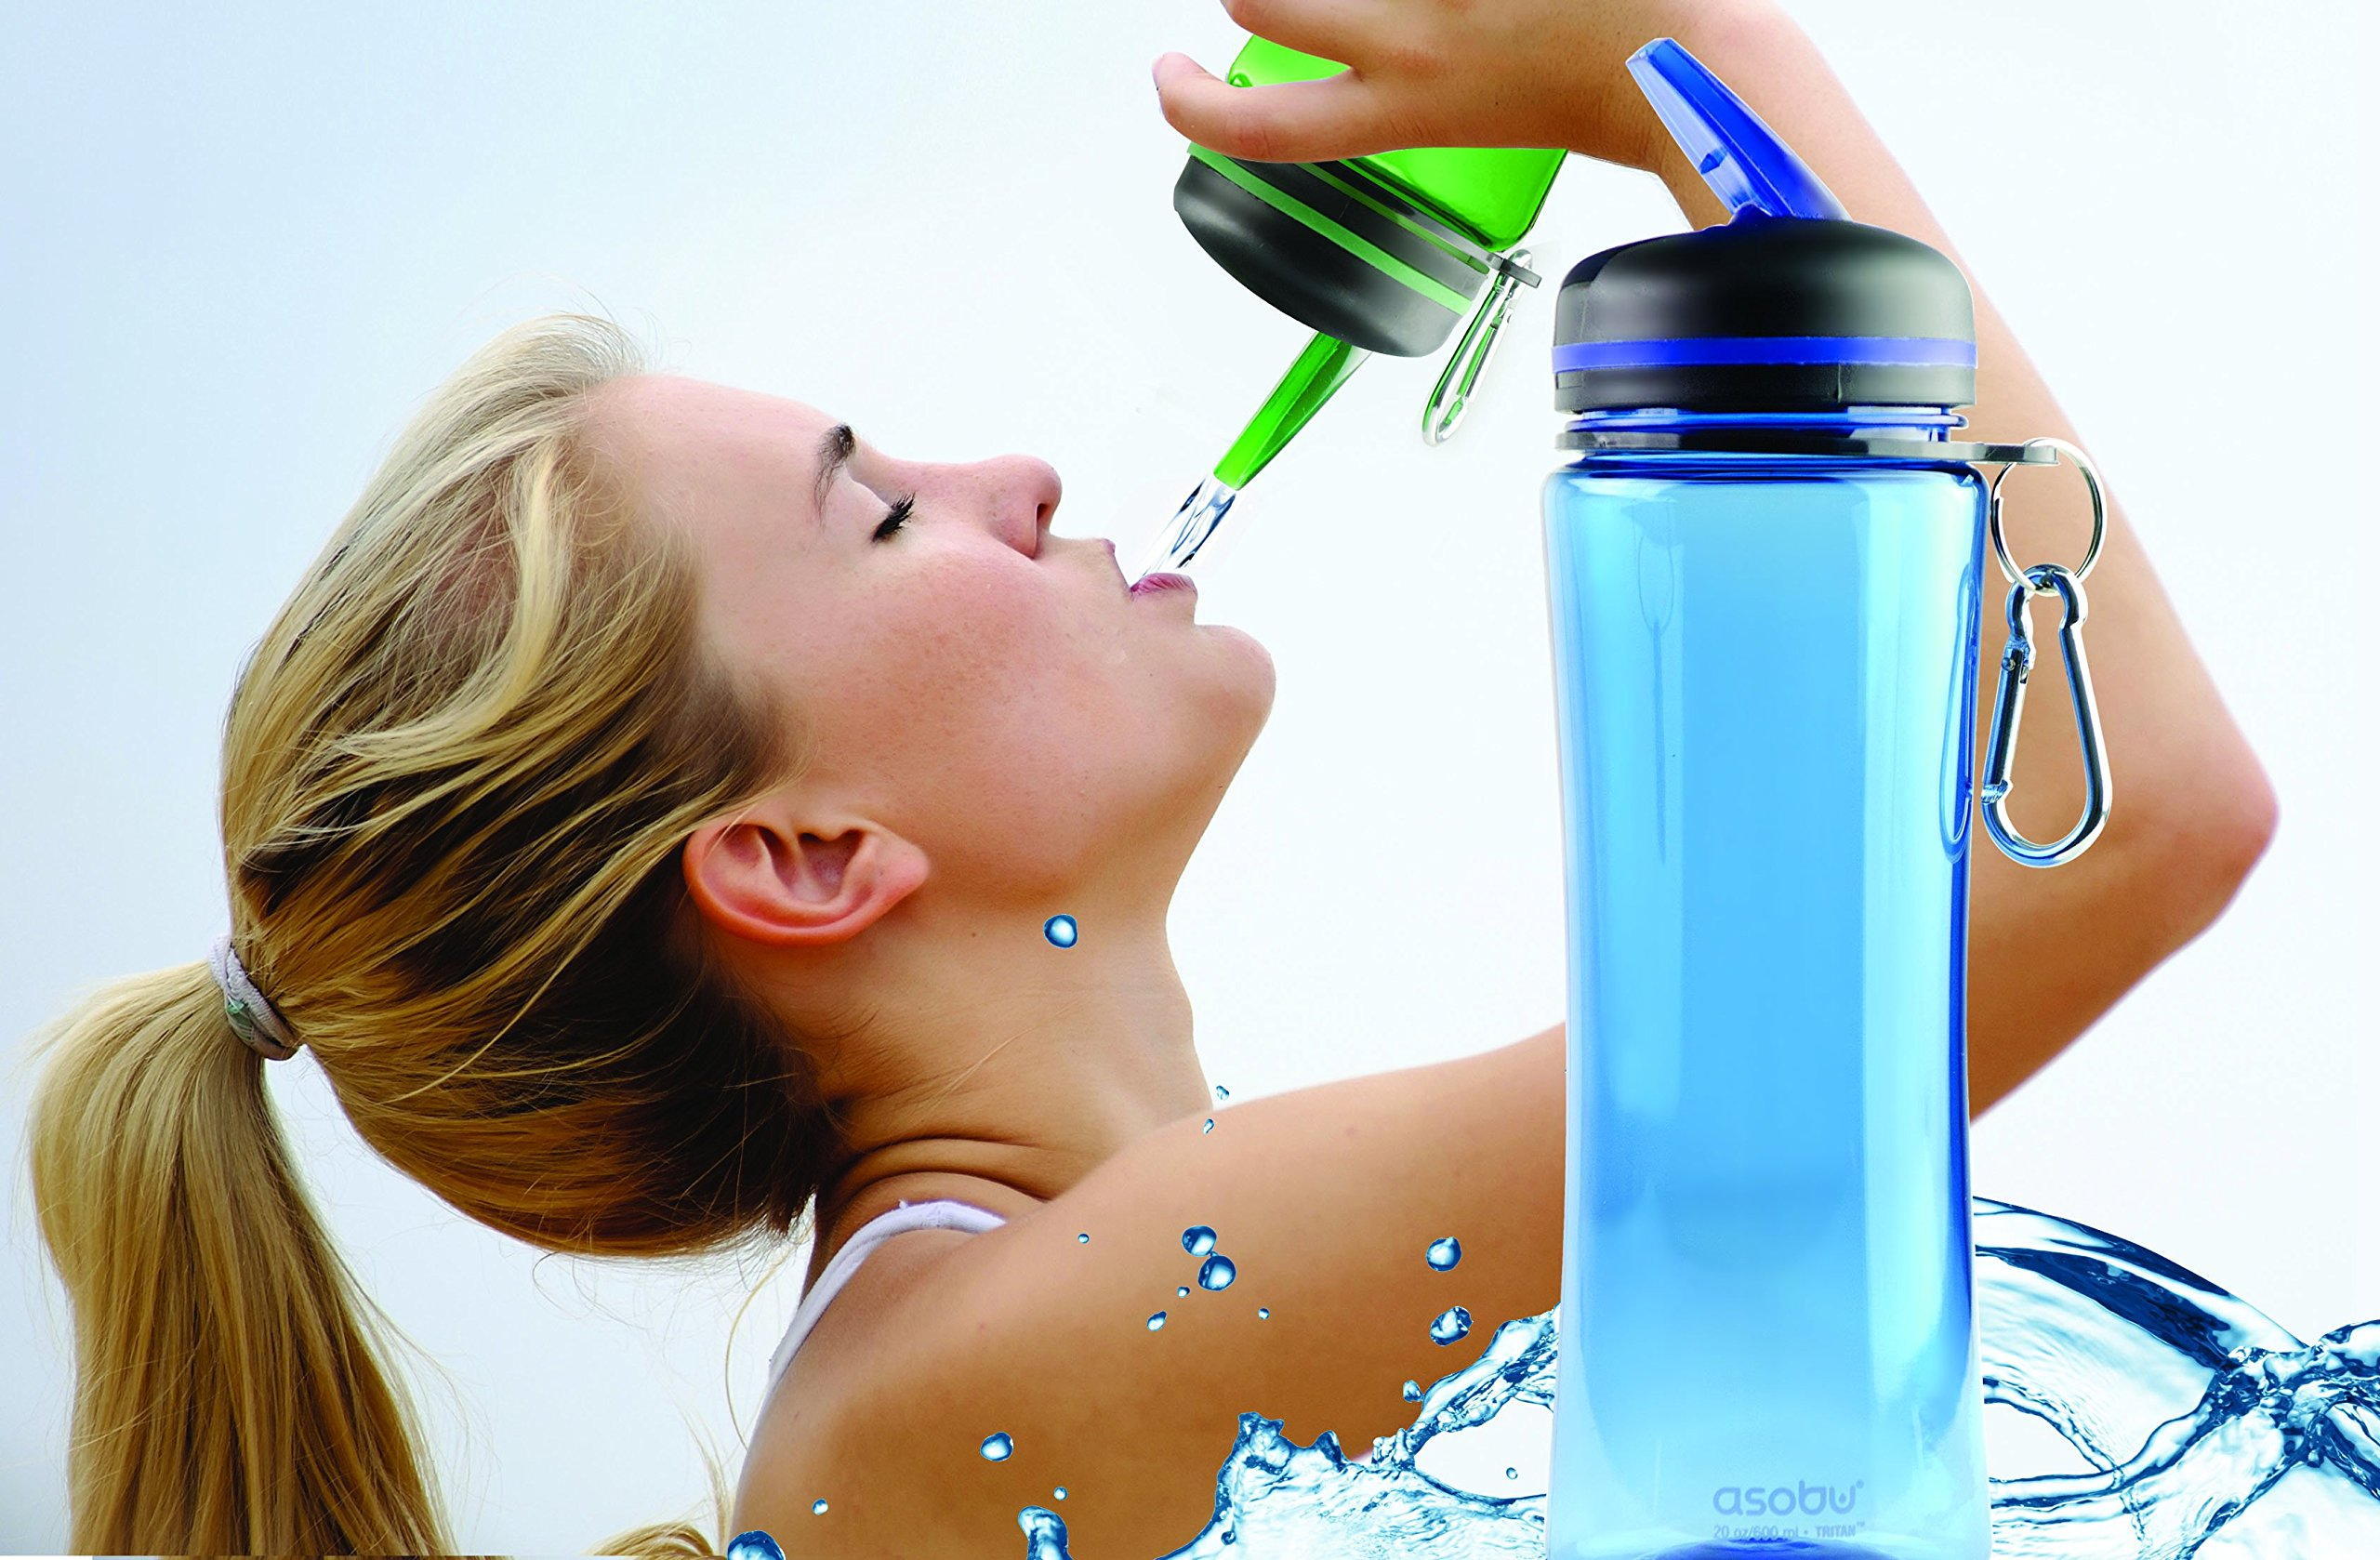 The Asobu TRIUMPH SPORT HYDRATION BOTTLE 20oz Tritan Free Flow spout Water bottle (Clear) by Asobu (Image #2)